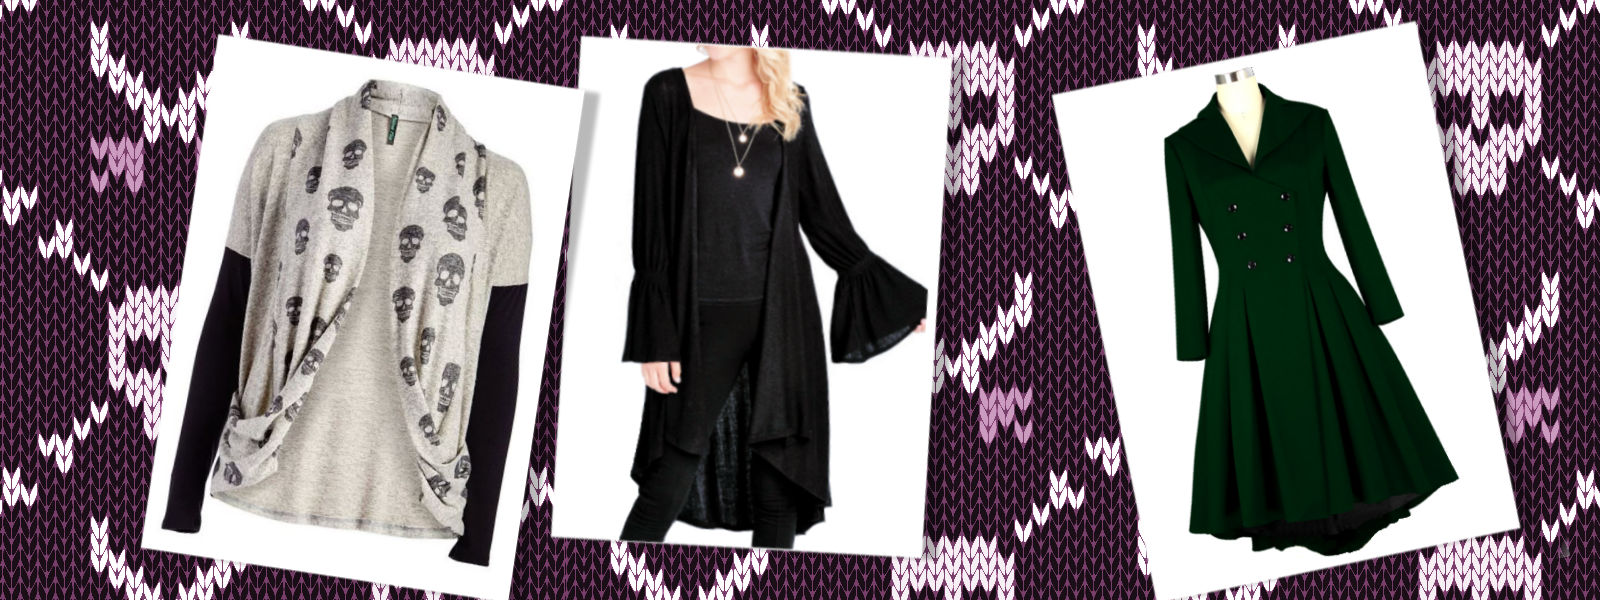 gothic coats